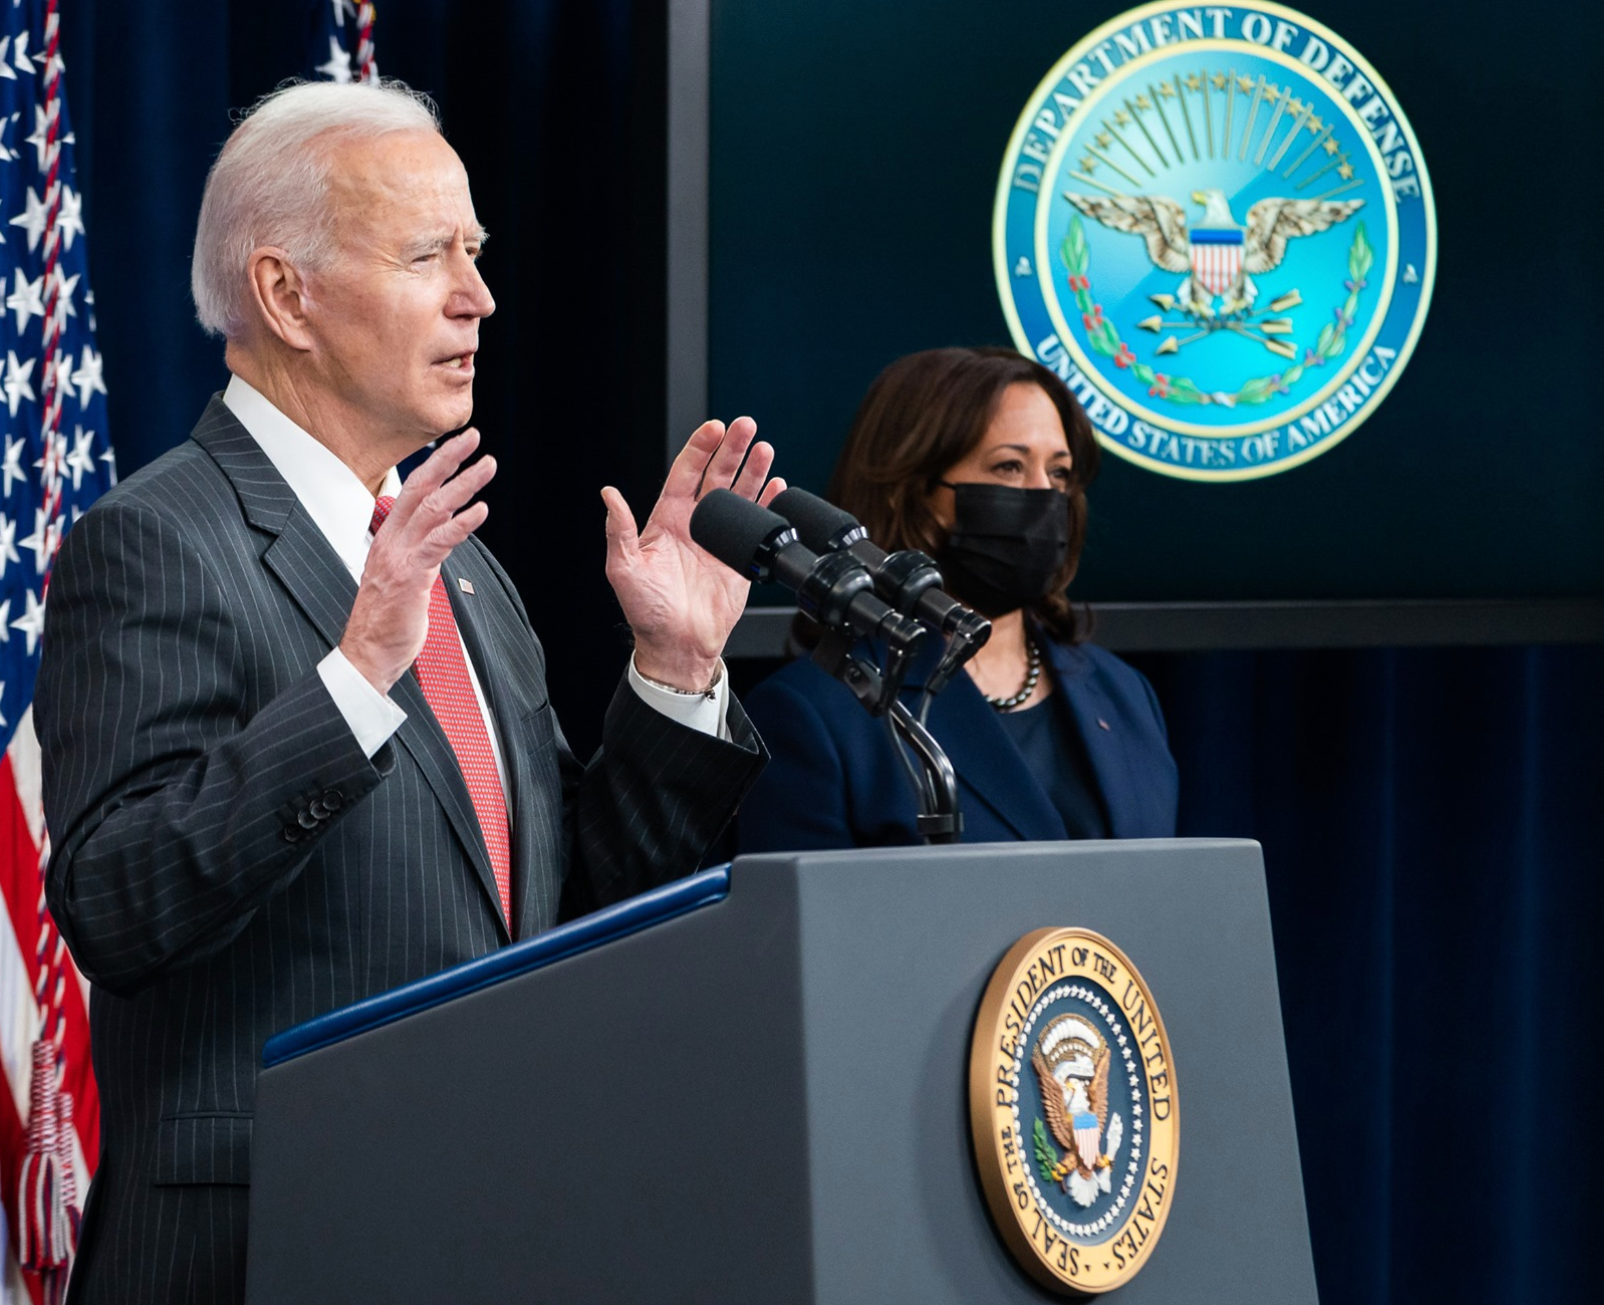 Biden unveils his expansive immigration agenda